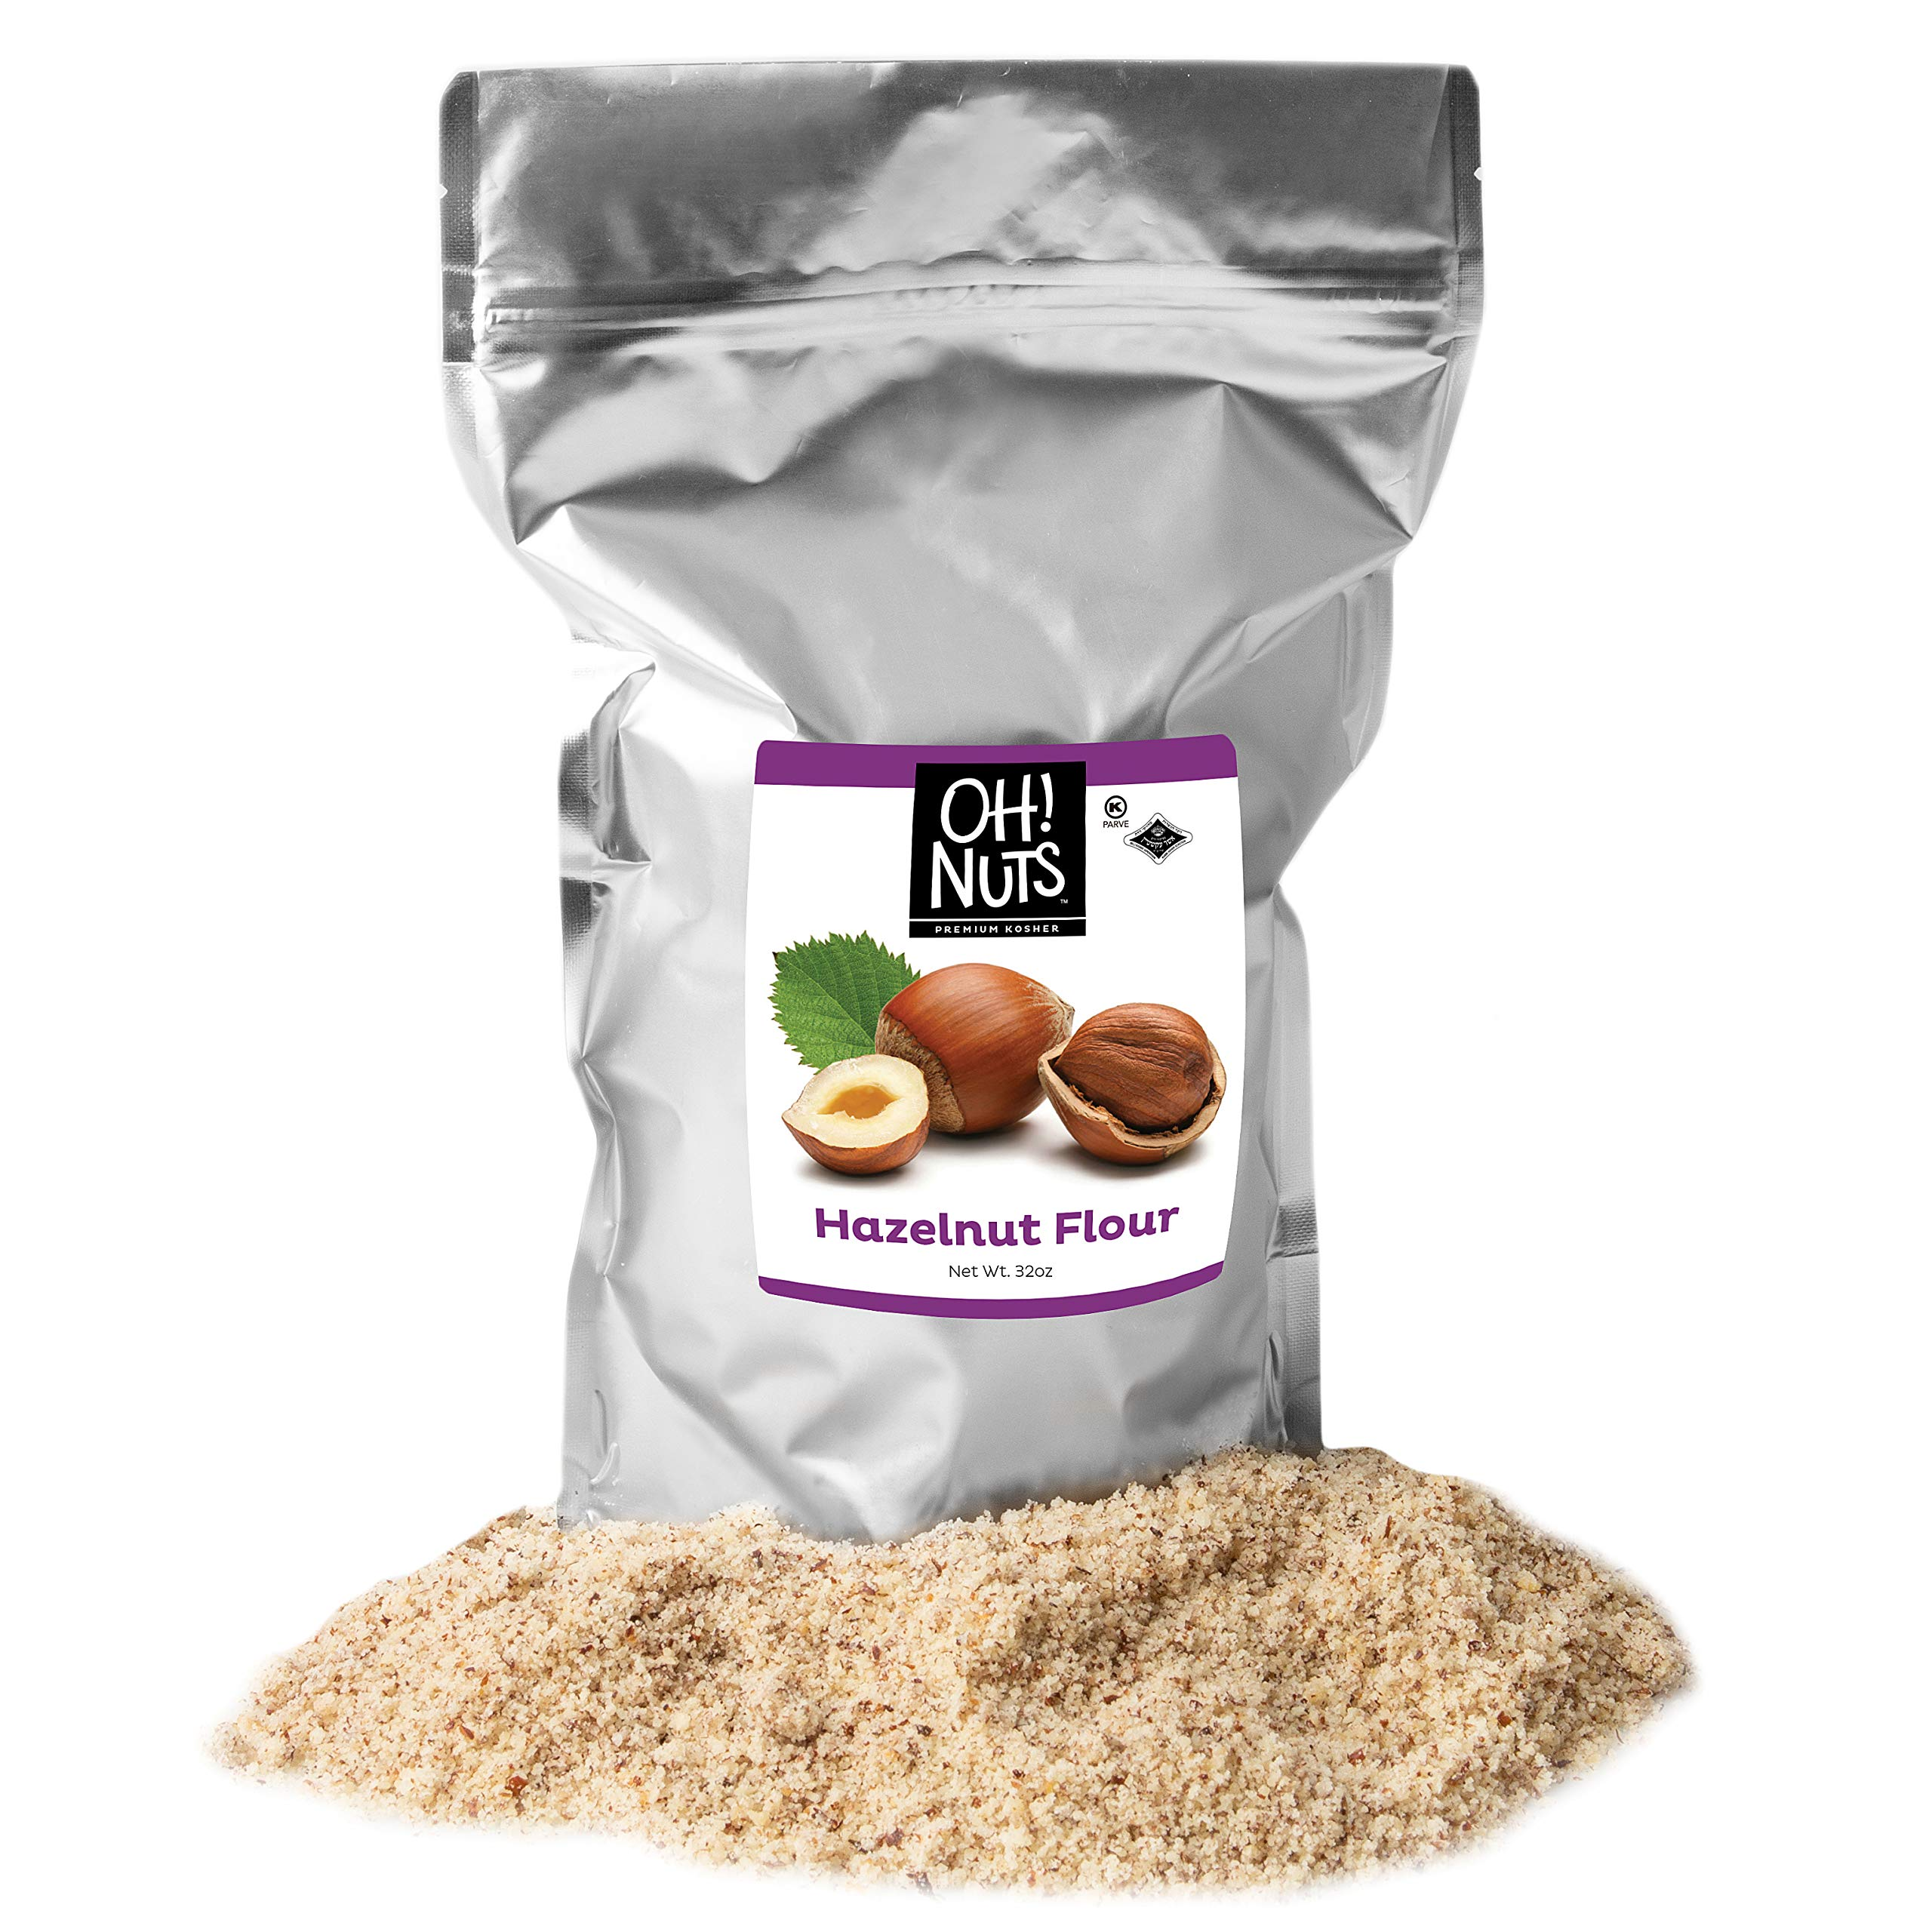 Oh! Nuts Ground Hazelnut Flour   2lb Bulk Bag Keto-Friendly Nut Flour from Ground Filberts, Kosher Gluten Free Baking Hazelnuts Meal, Vegan Milled Filberts   Healthy Alternative Certified Kosher